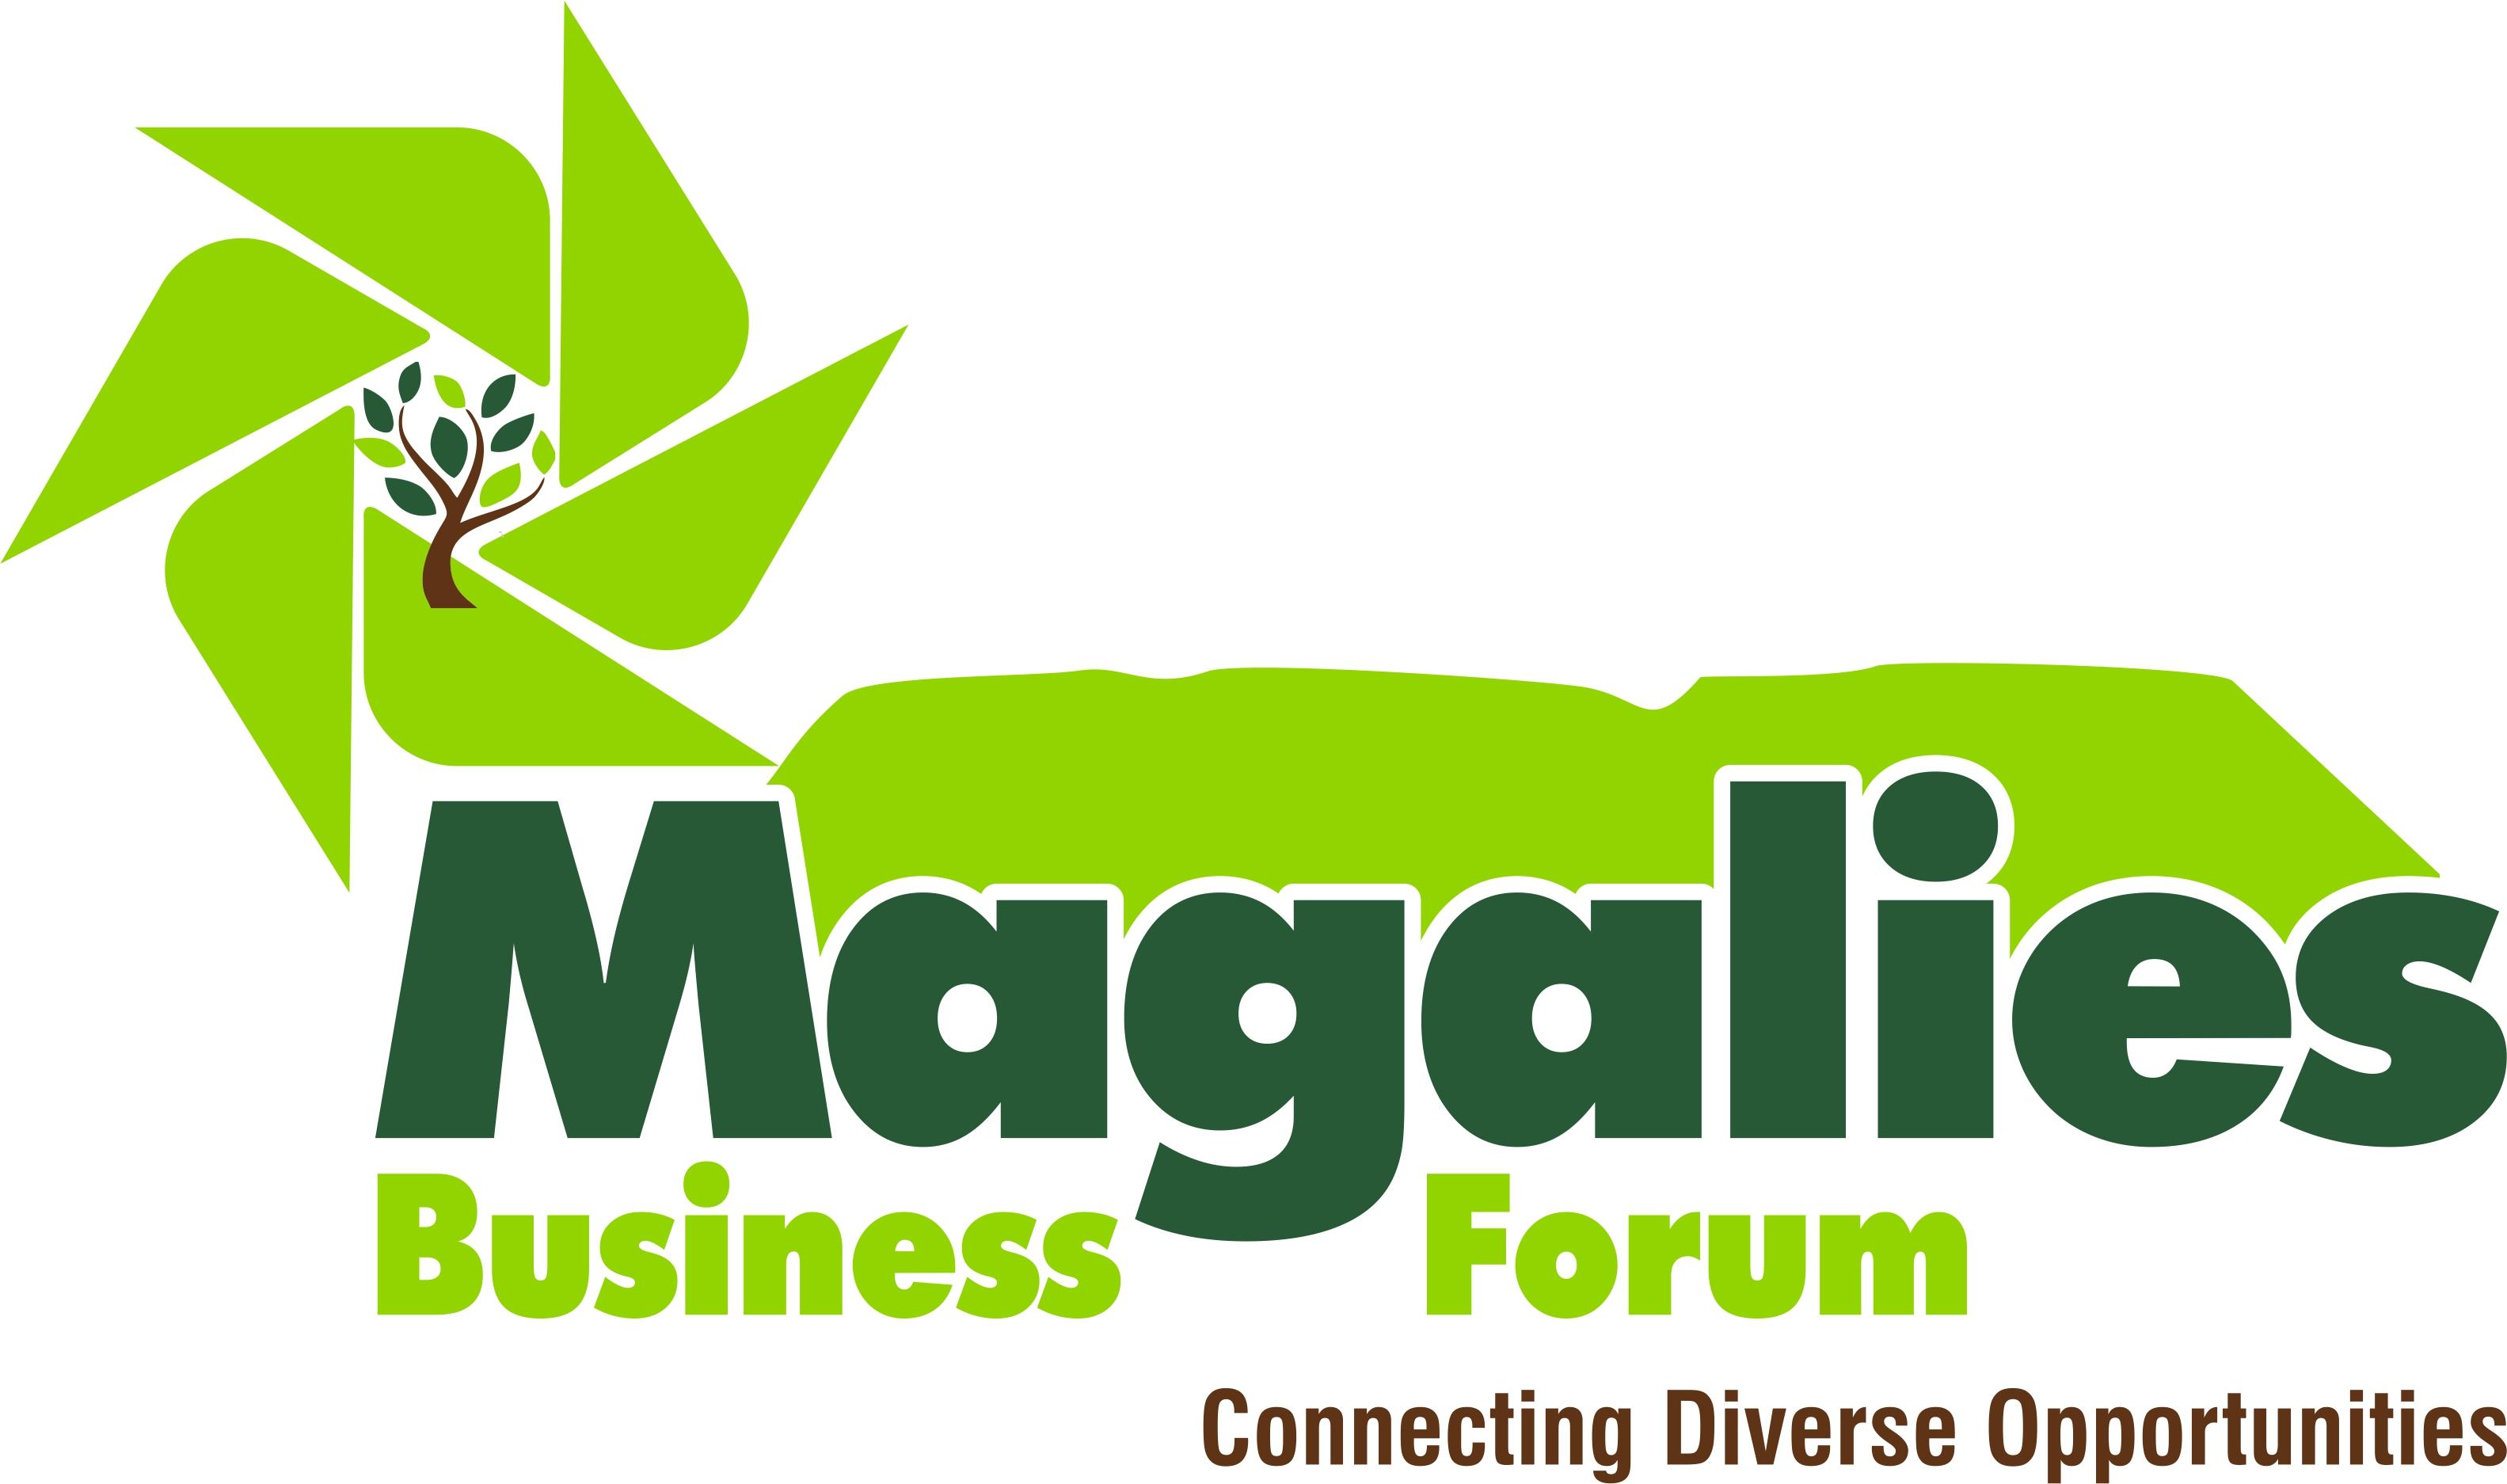 http://www.magaliesbusinessforum.co.za/